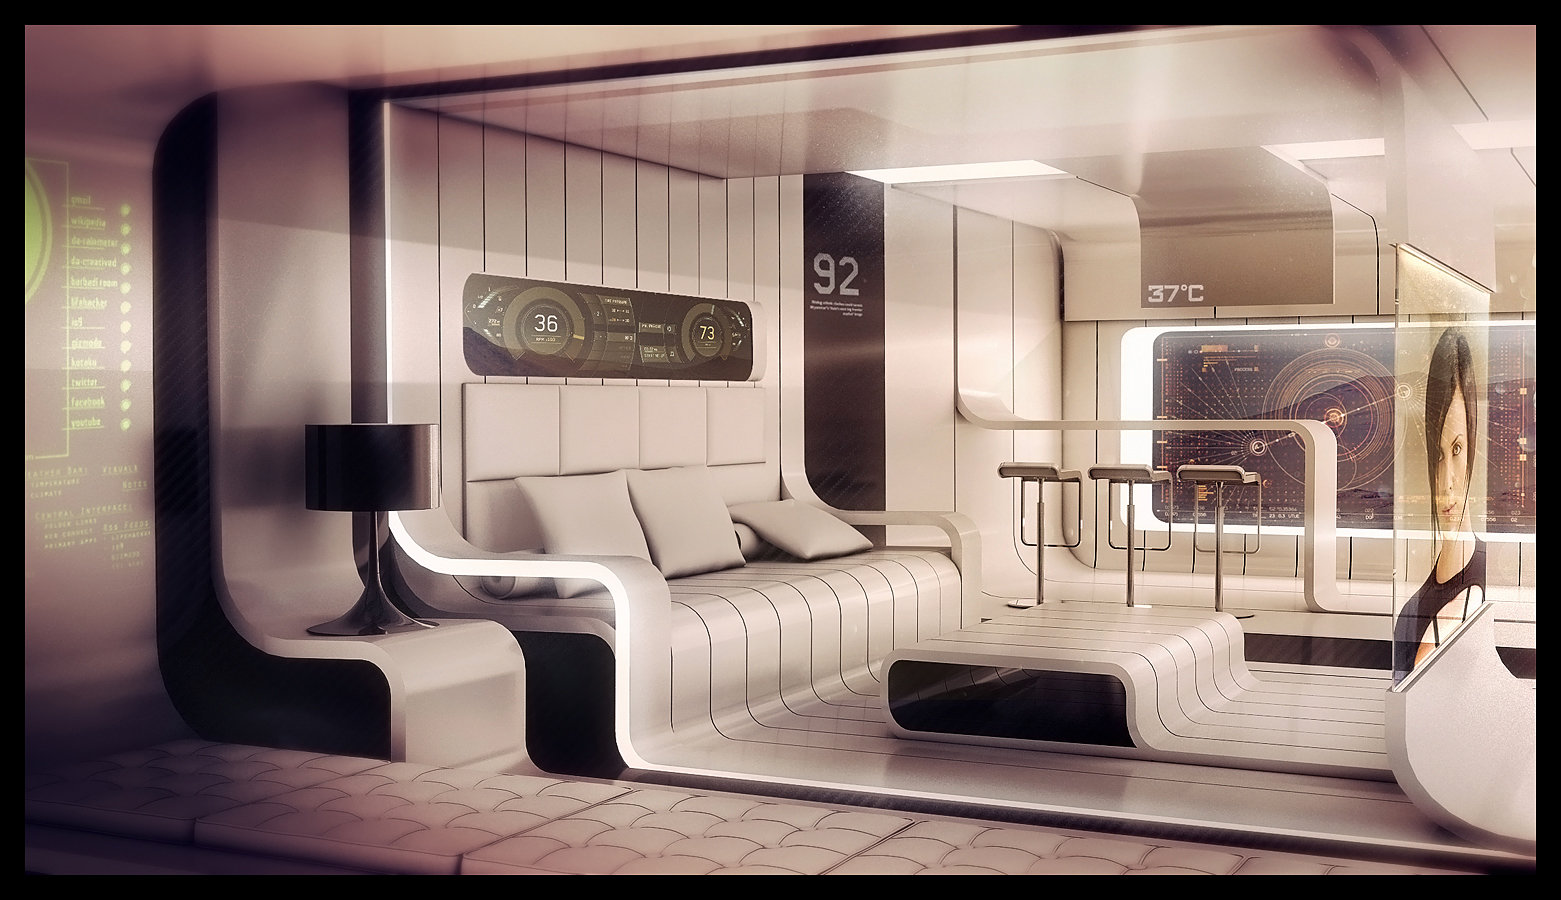 Superb futuristic 3d sci fi art by encho enchev concept for Sci fi decor